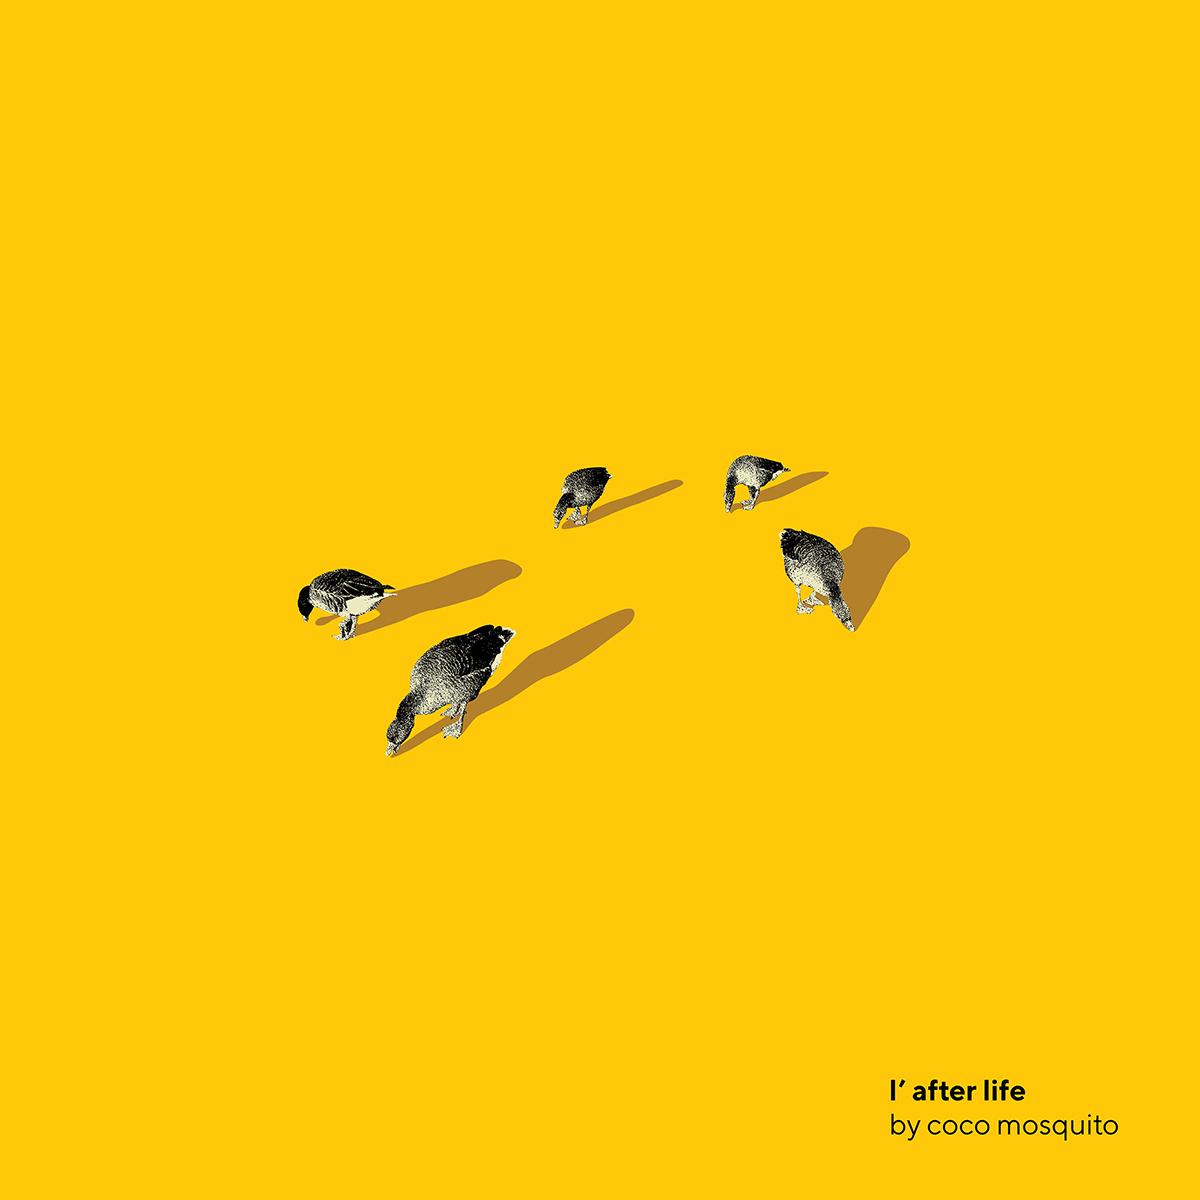 l'after life by coco mosquto - design by Nenad Radojčić